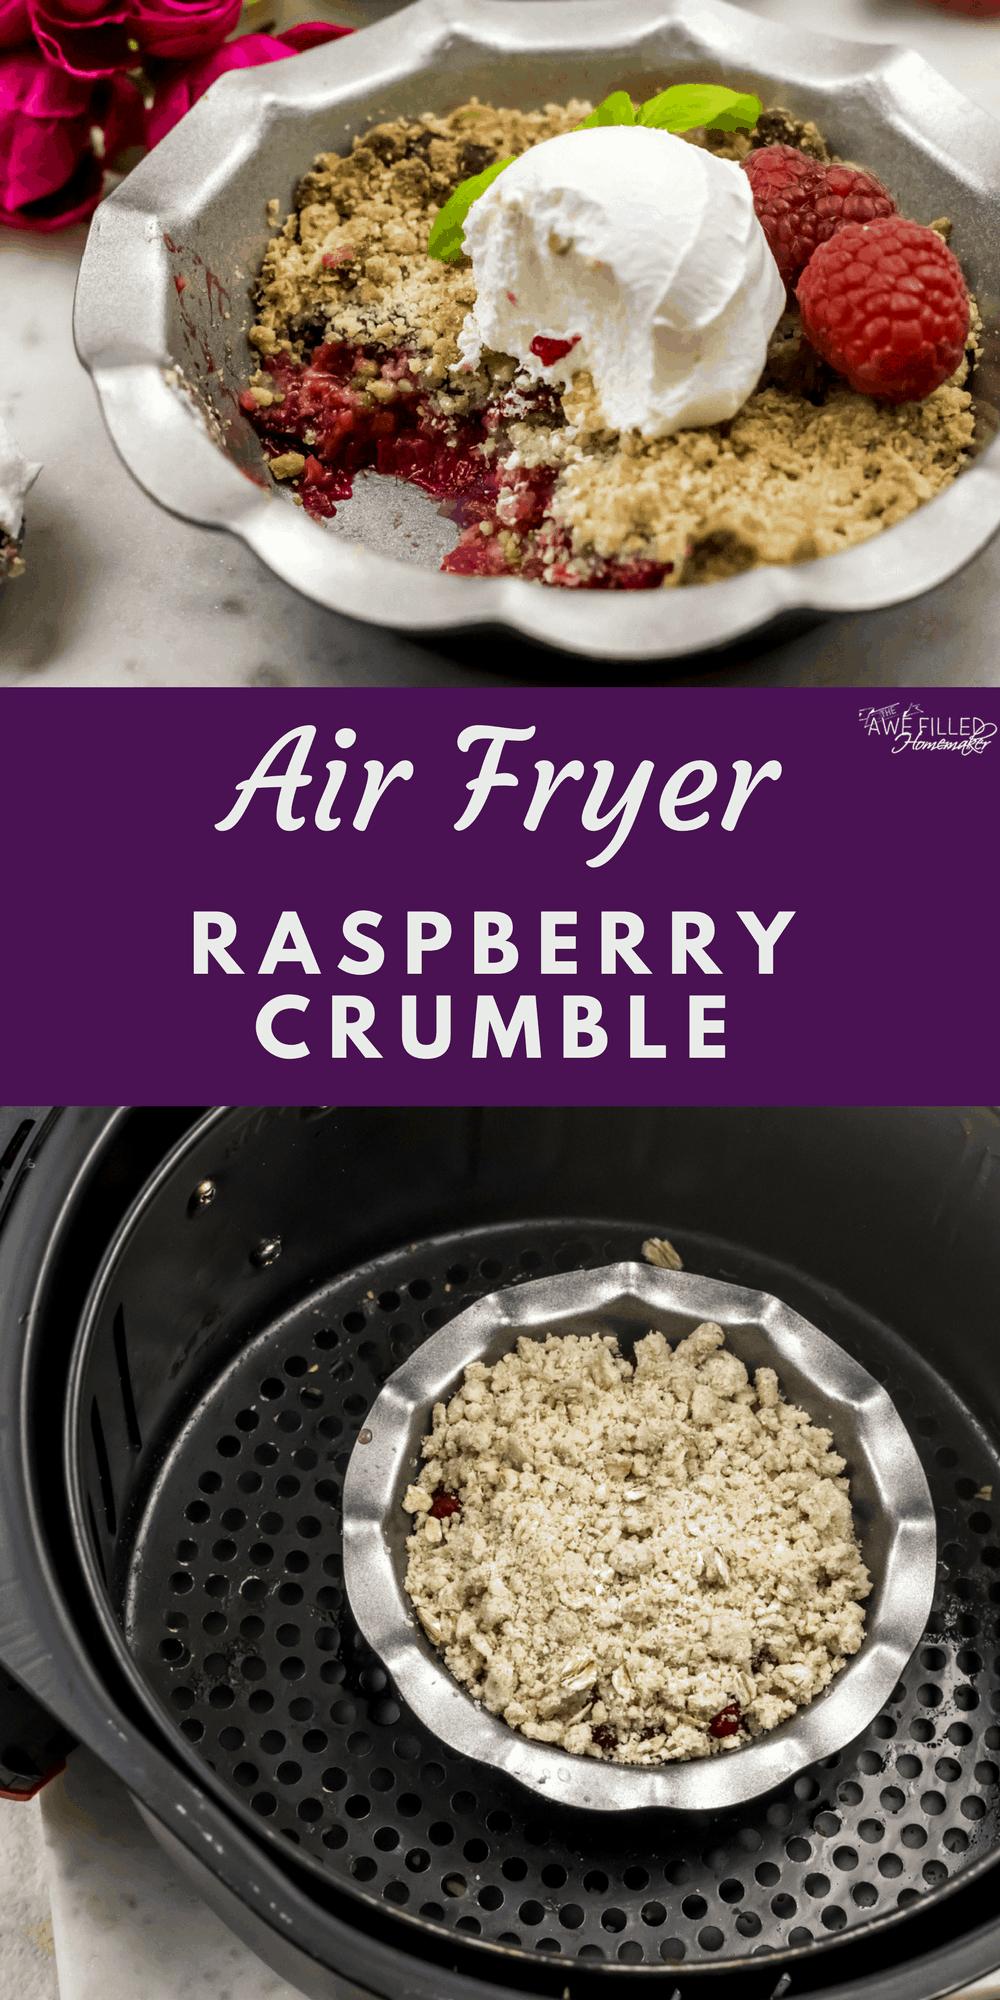 Air Fryer Raspberry Crumble Recipe Raspberry crumble